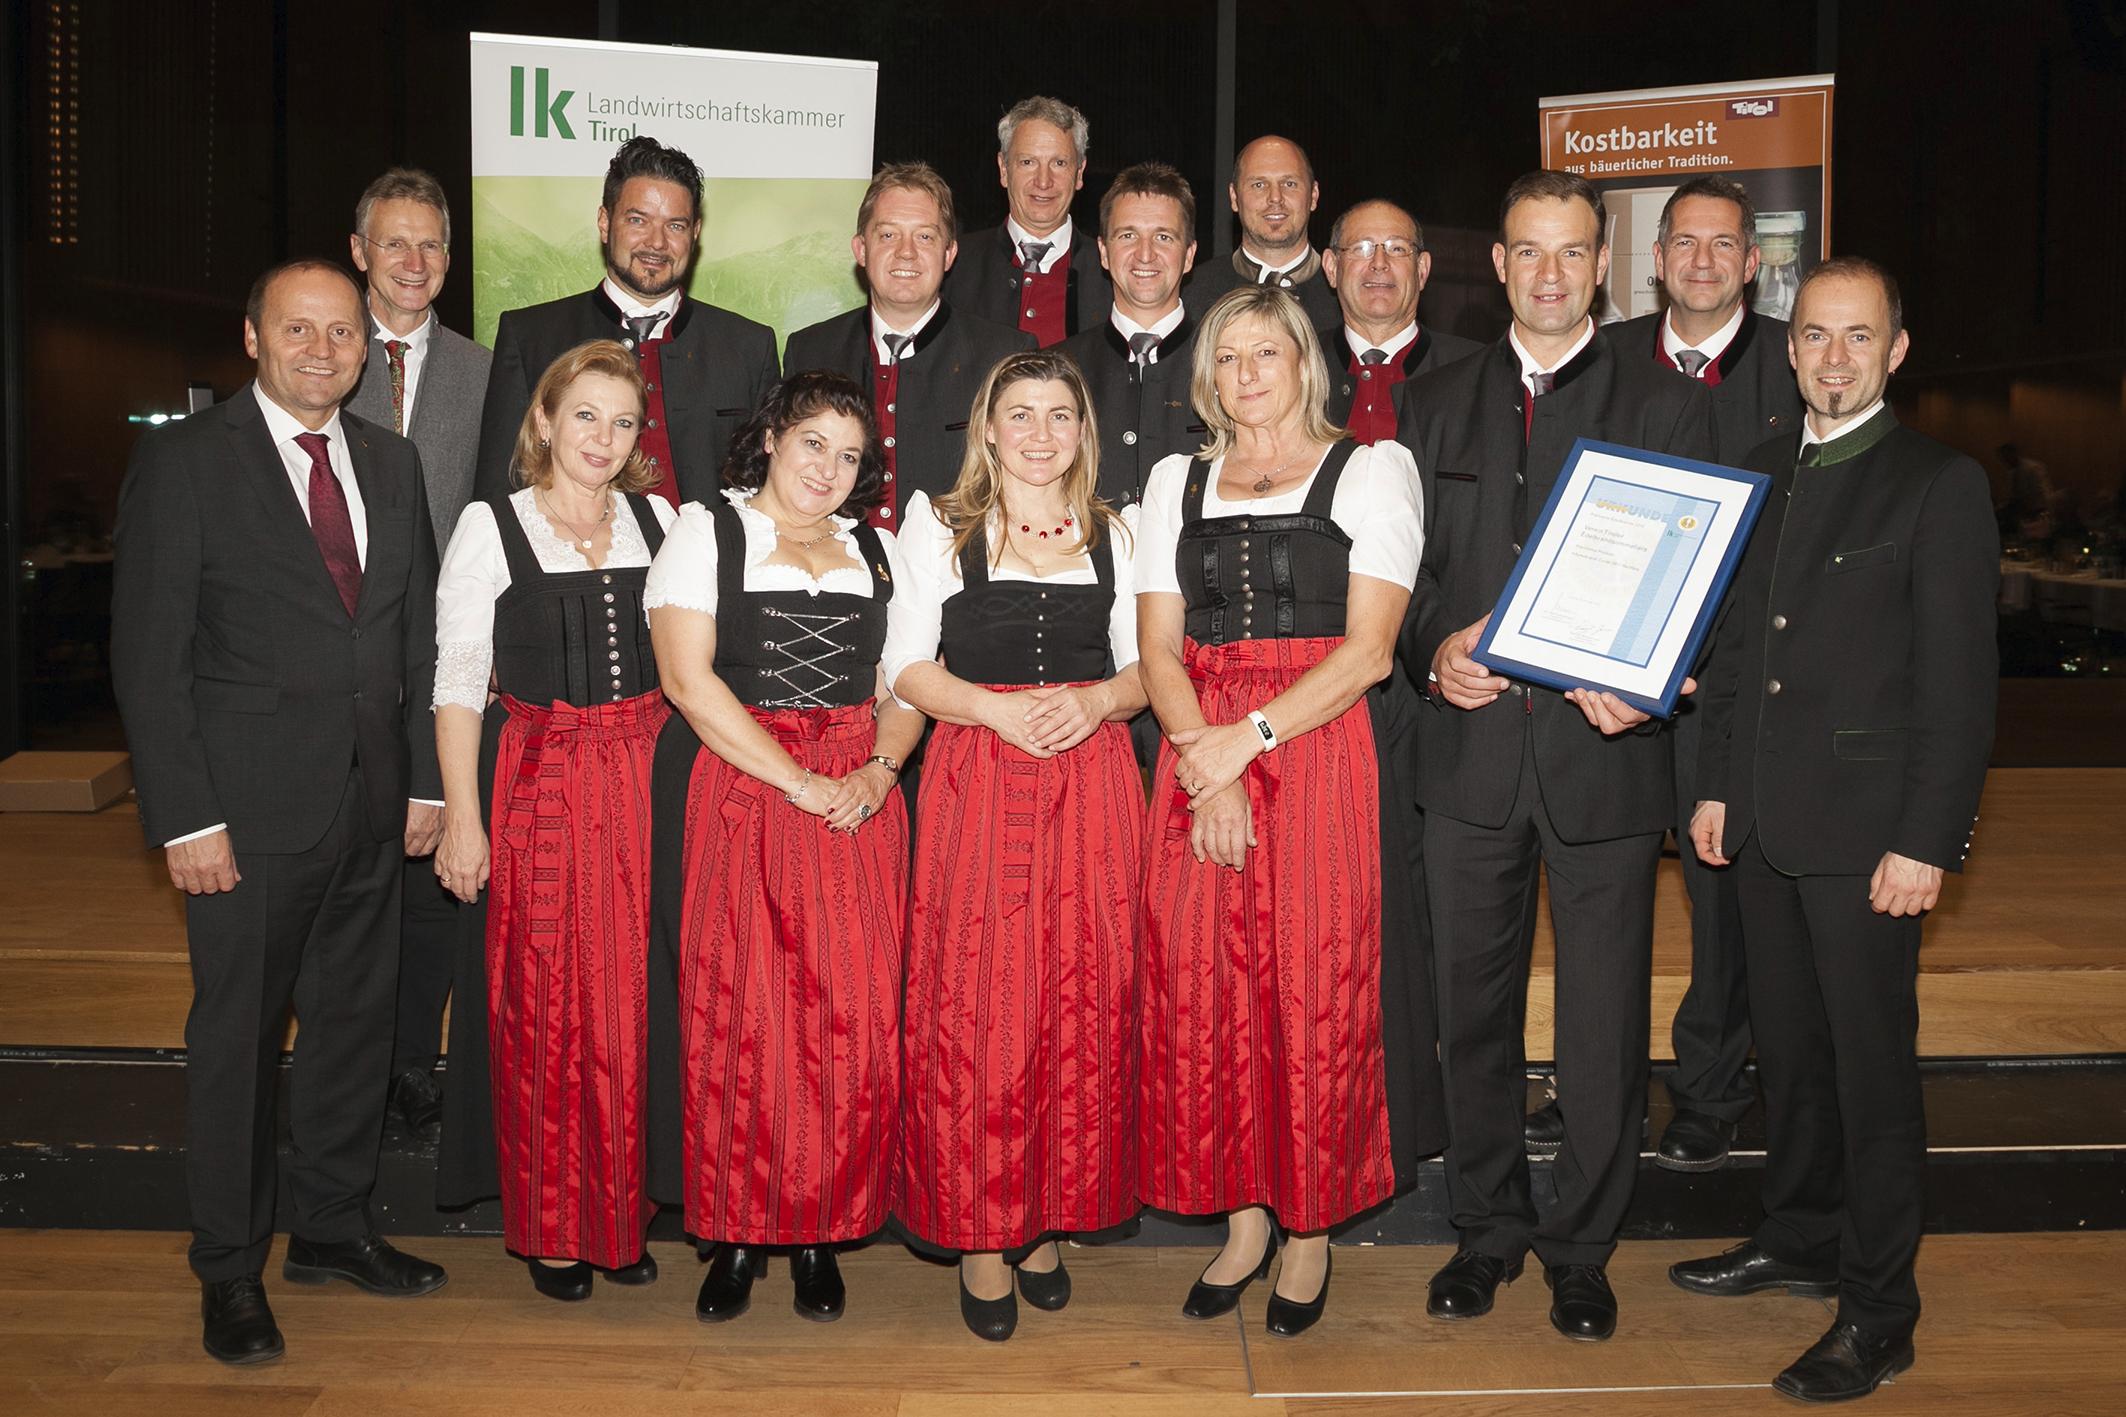 Edelbrandsommeliers Tirol (c) Die Fotografen